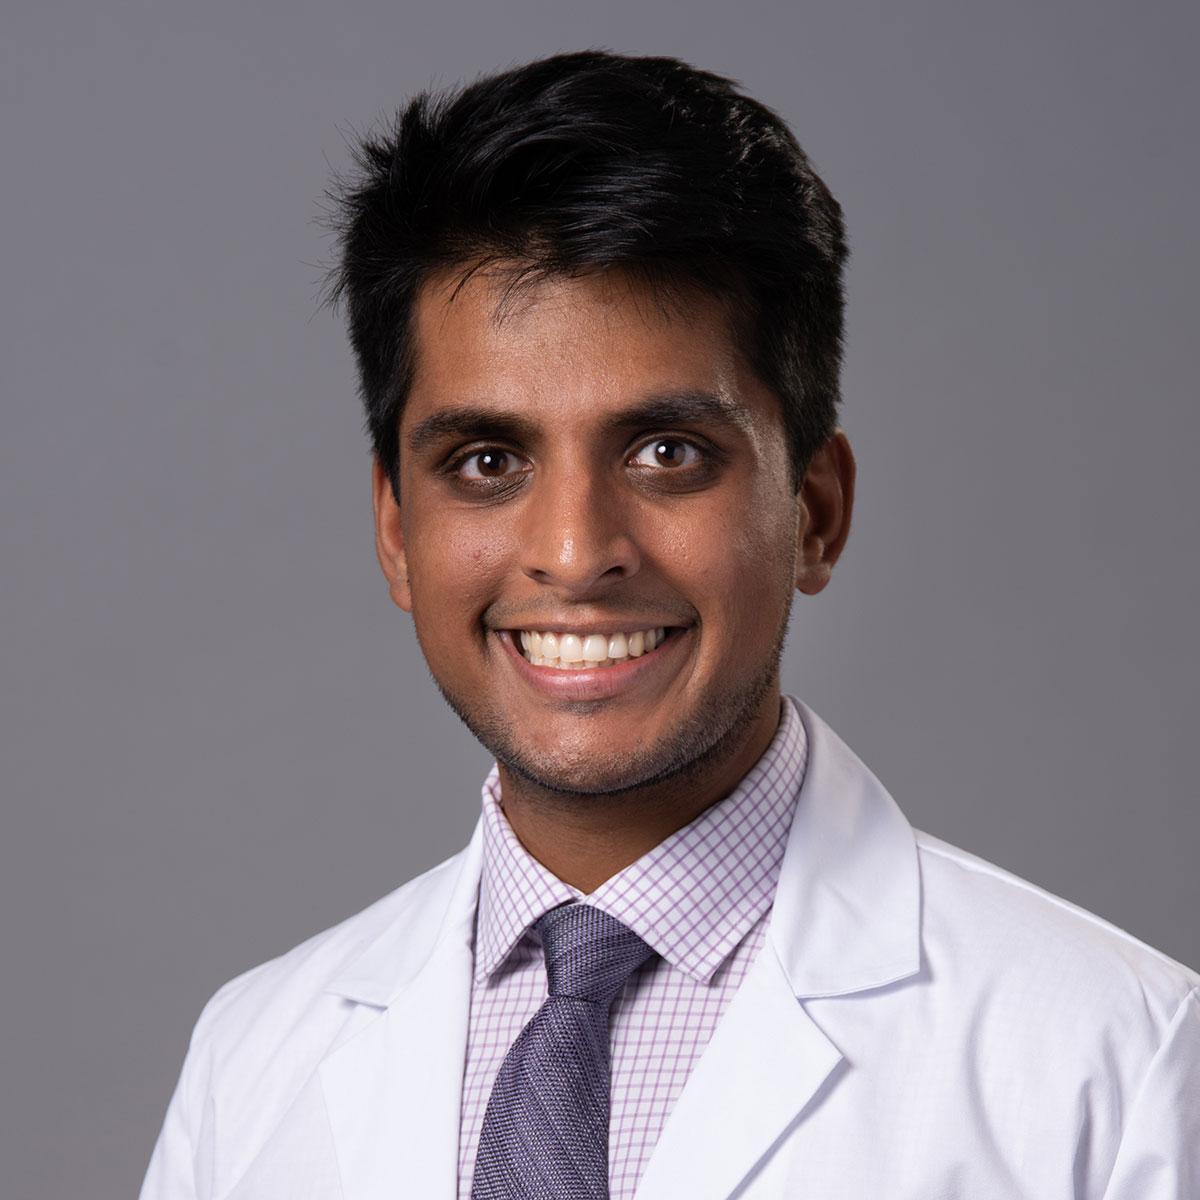 A friendly headshot of Dr. Sahil Patel